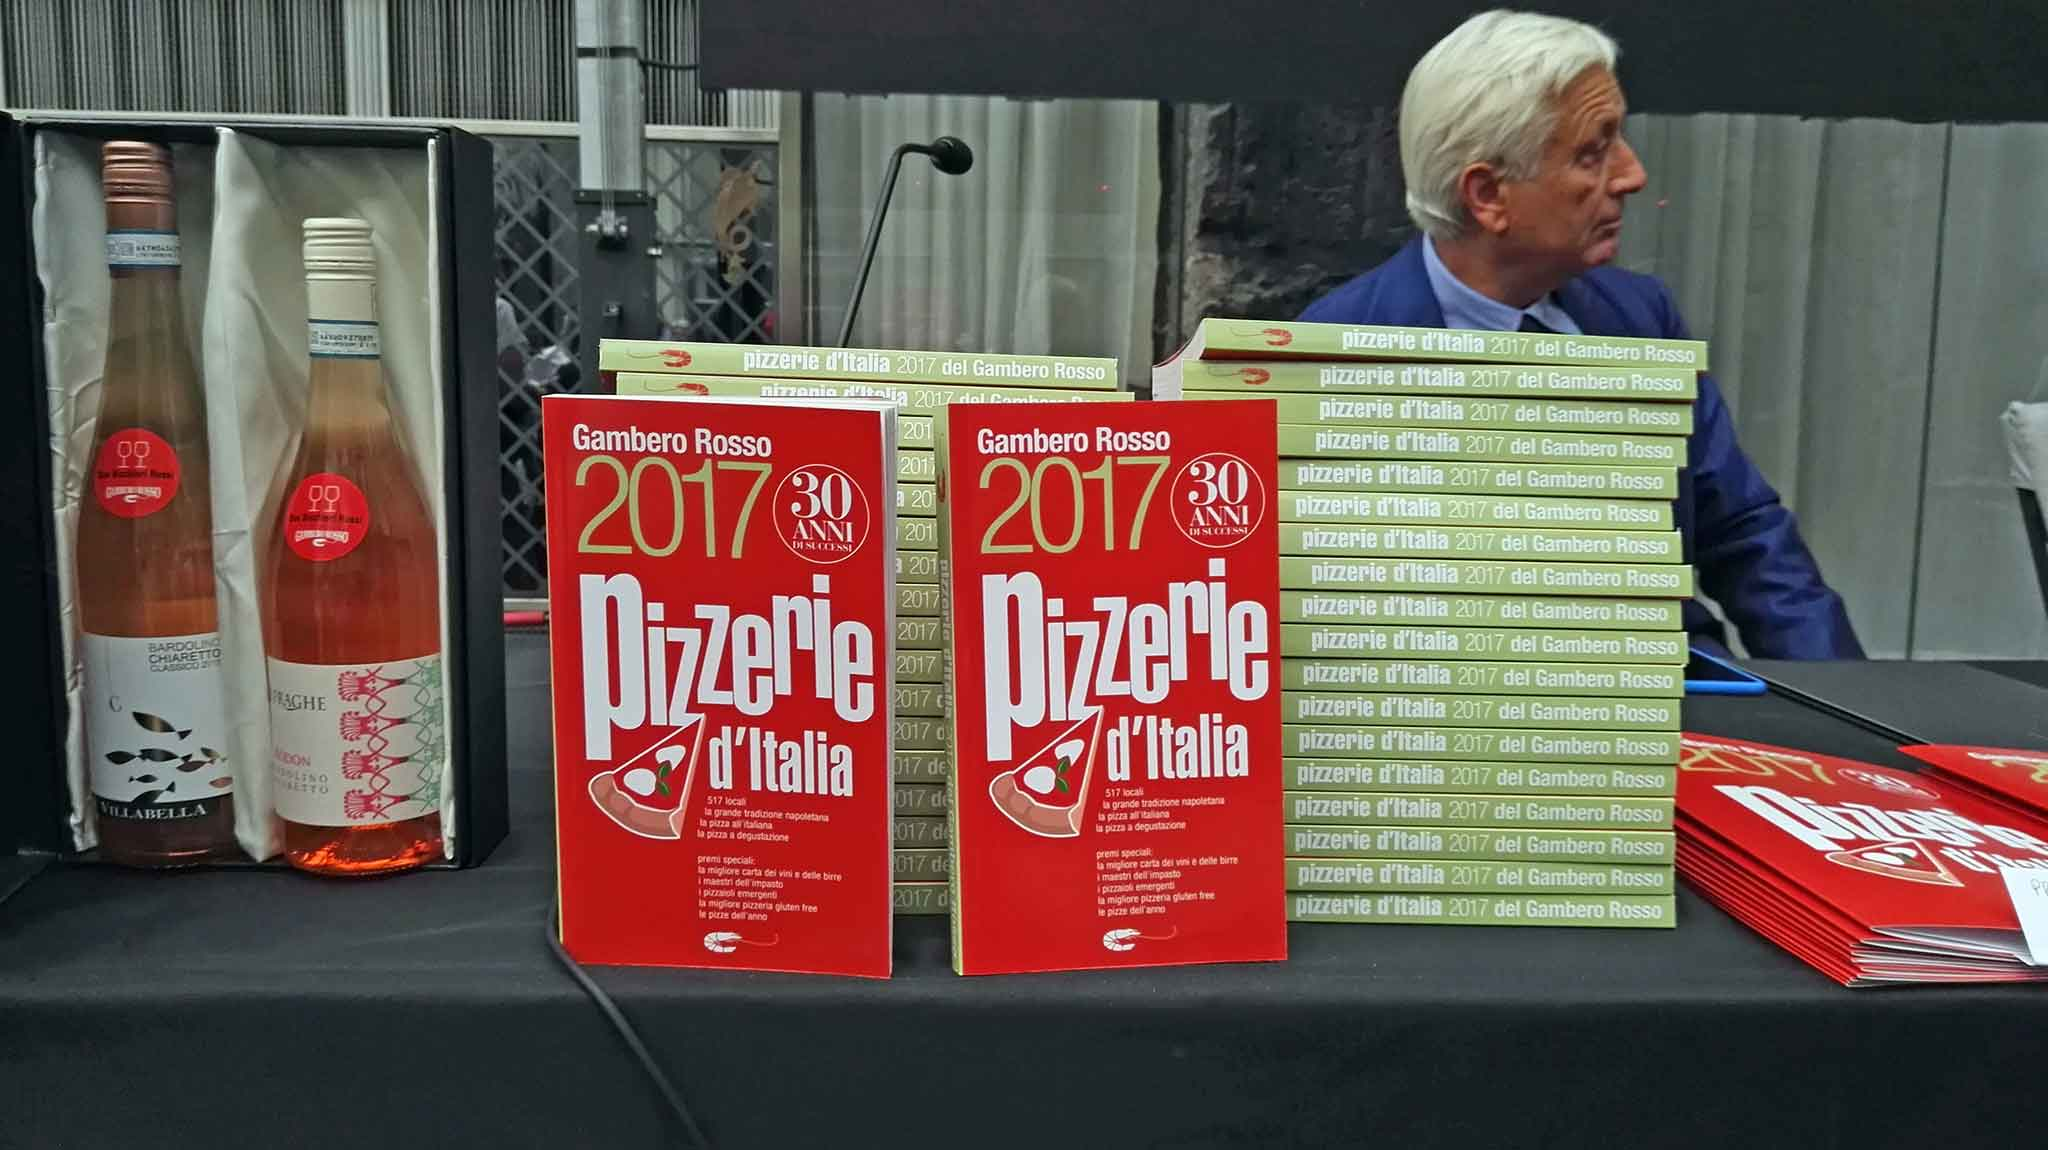 pizzerie-italia-guida-gambero-rosso-2017